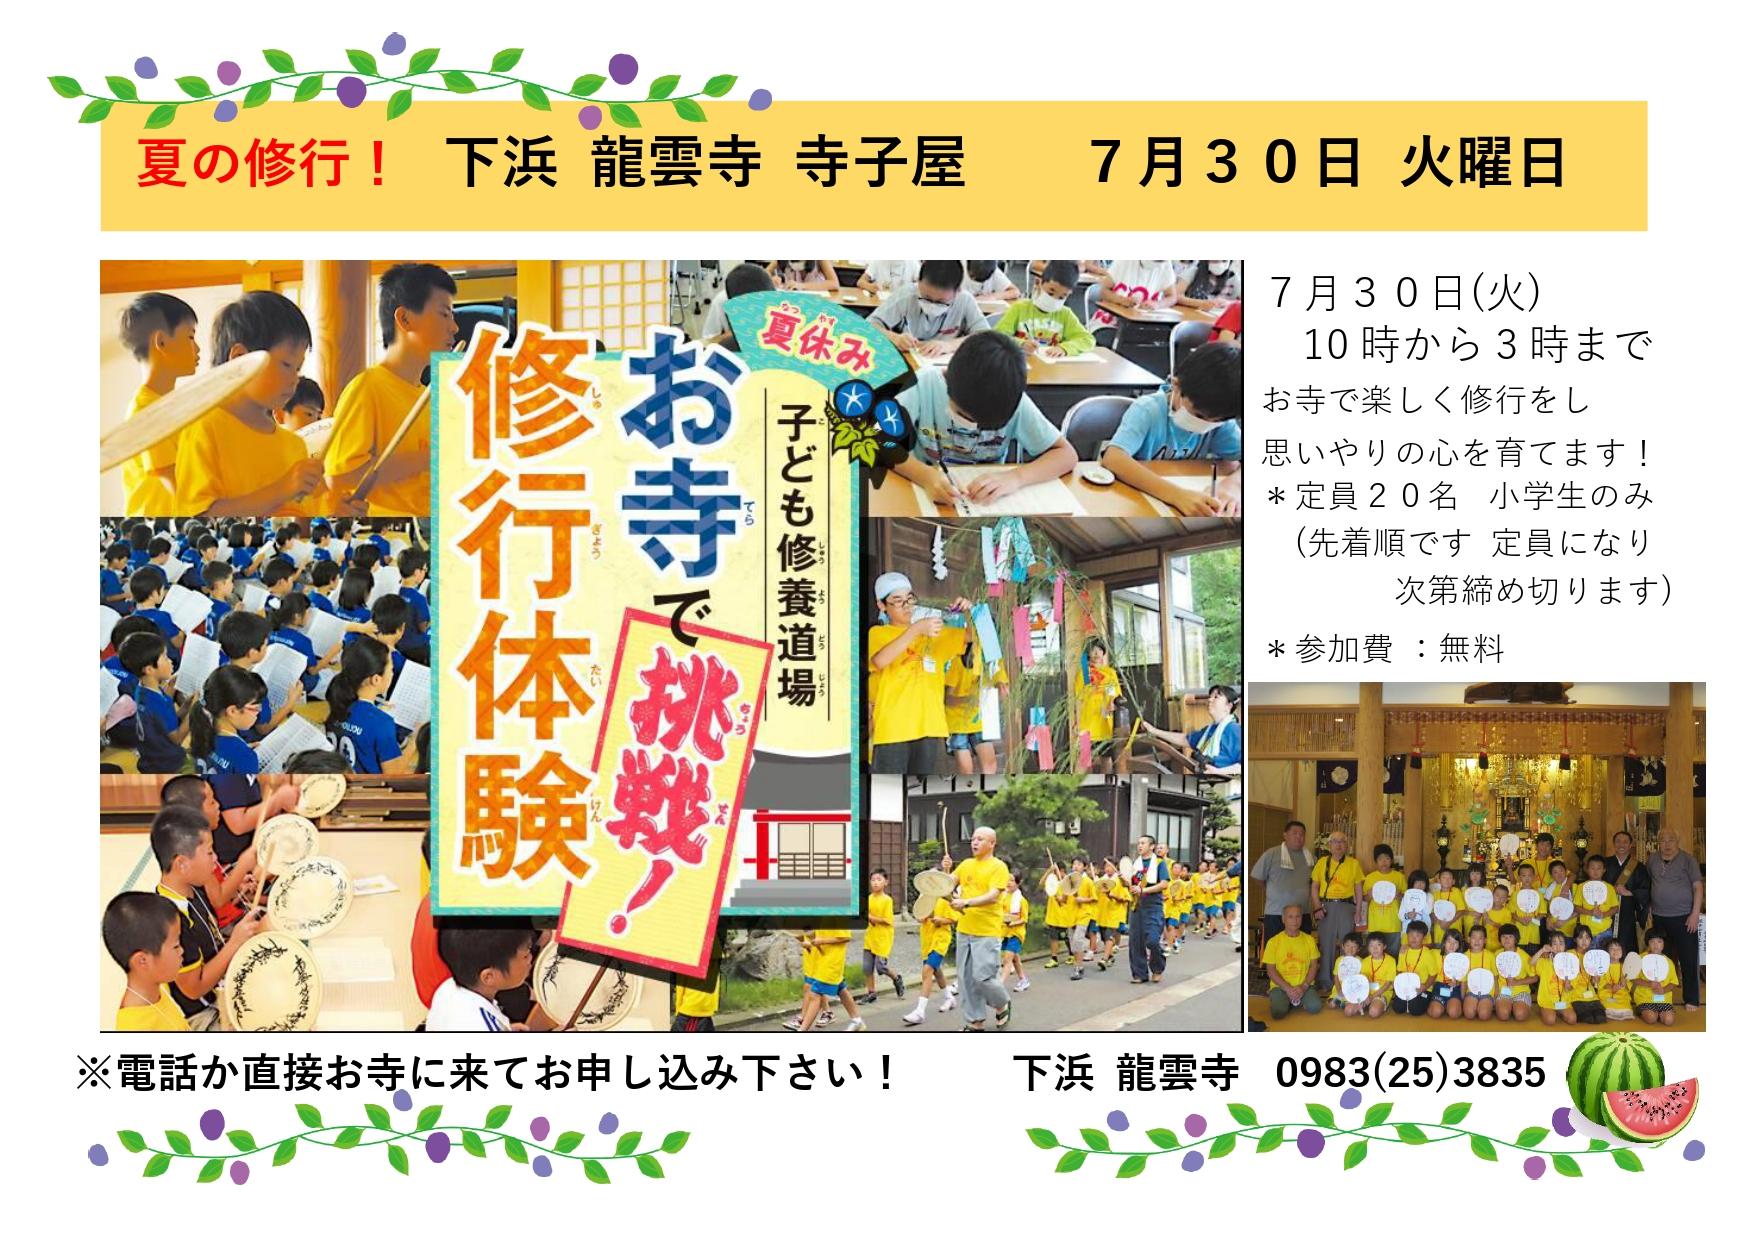 龍雲寺寺子屋 夏の修行 (1)_page-0001